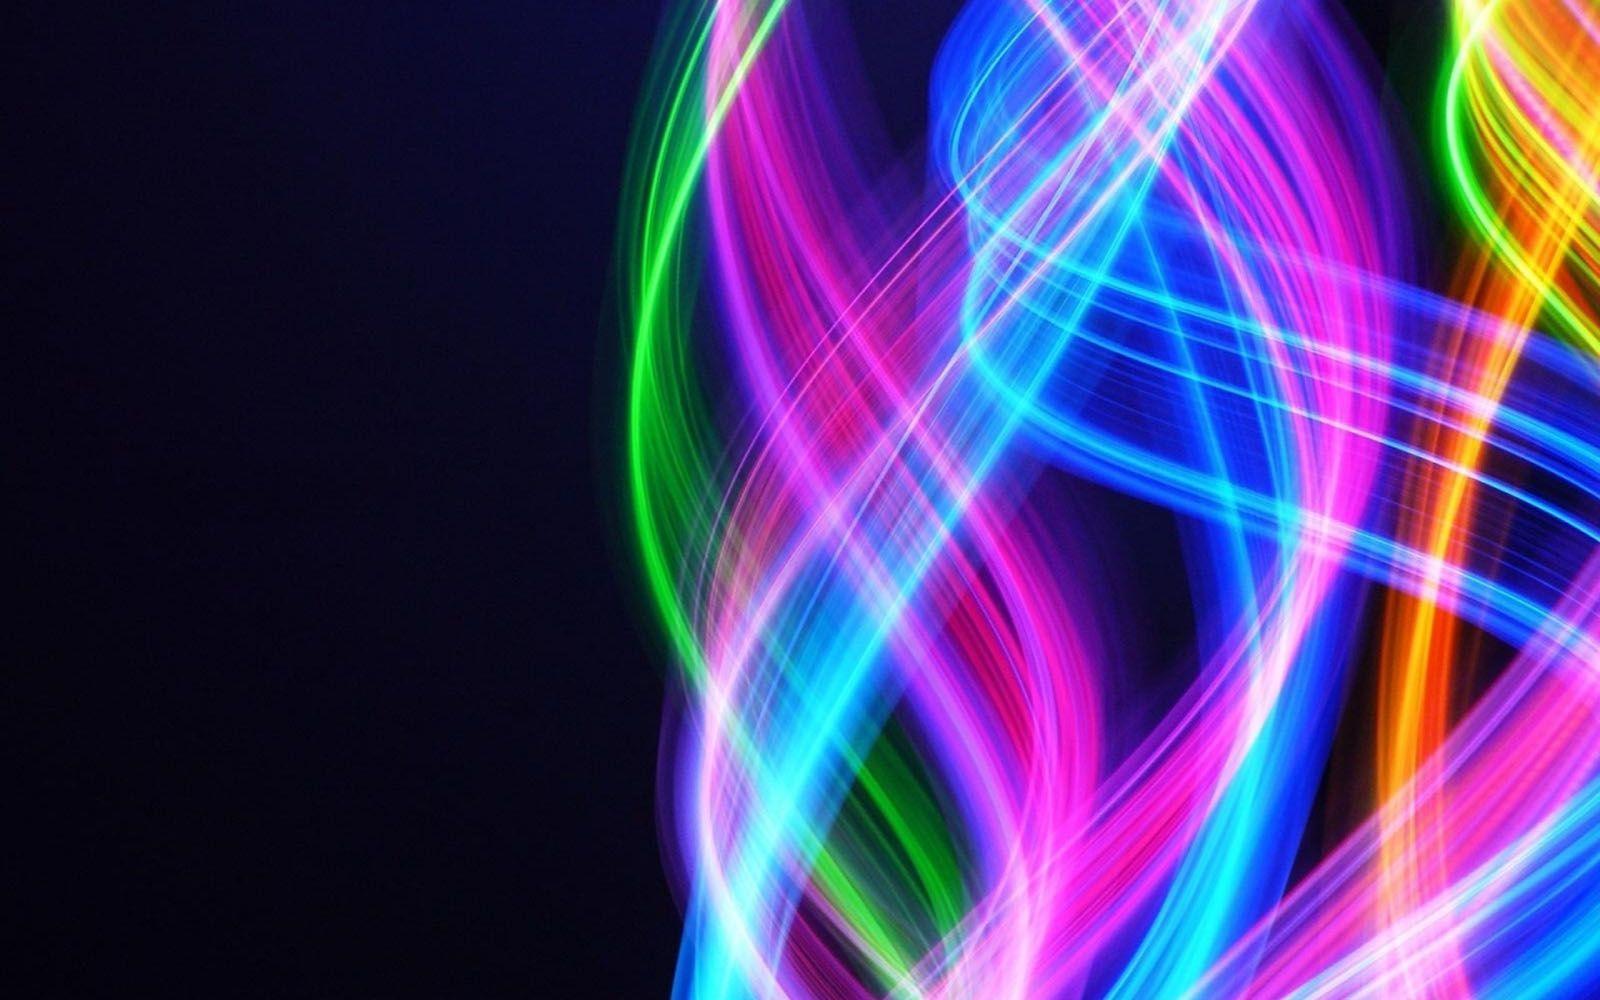 Neon Wallpaper Hd Resolution Neon Wallpaper Bright